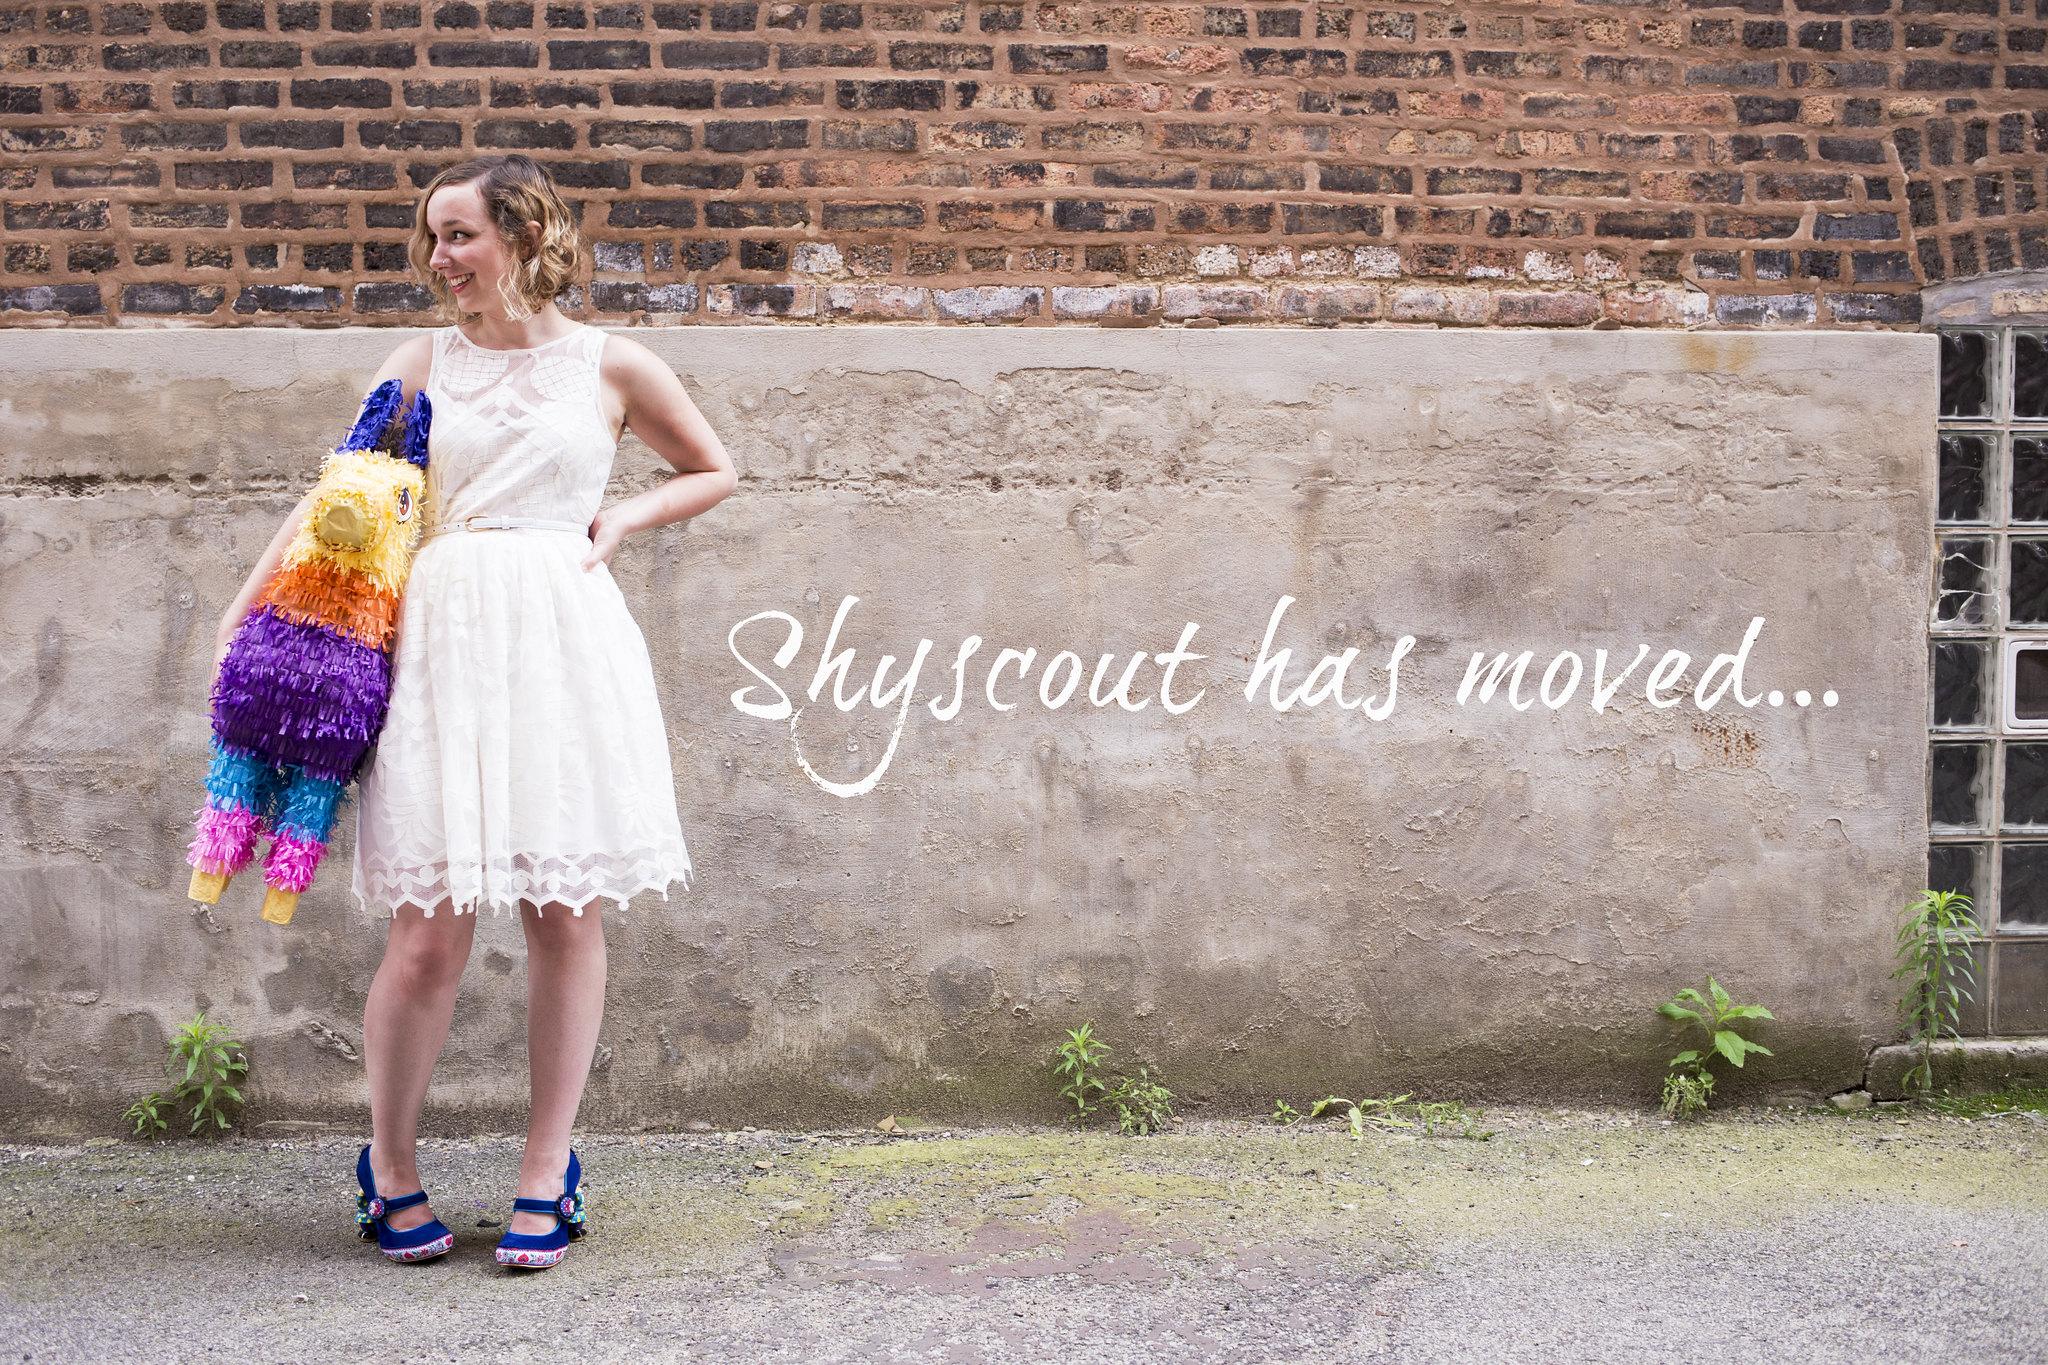 Shyscout 2.0